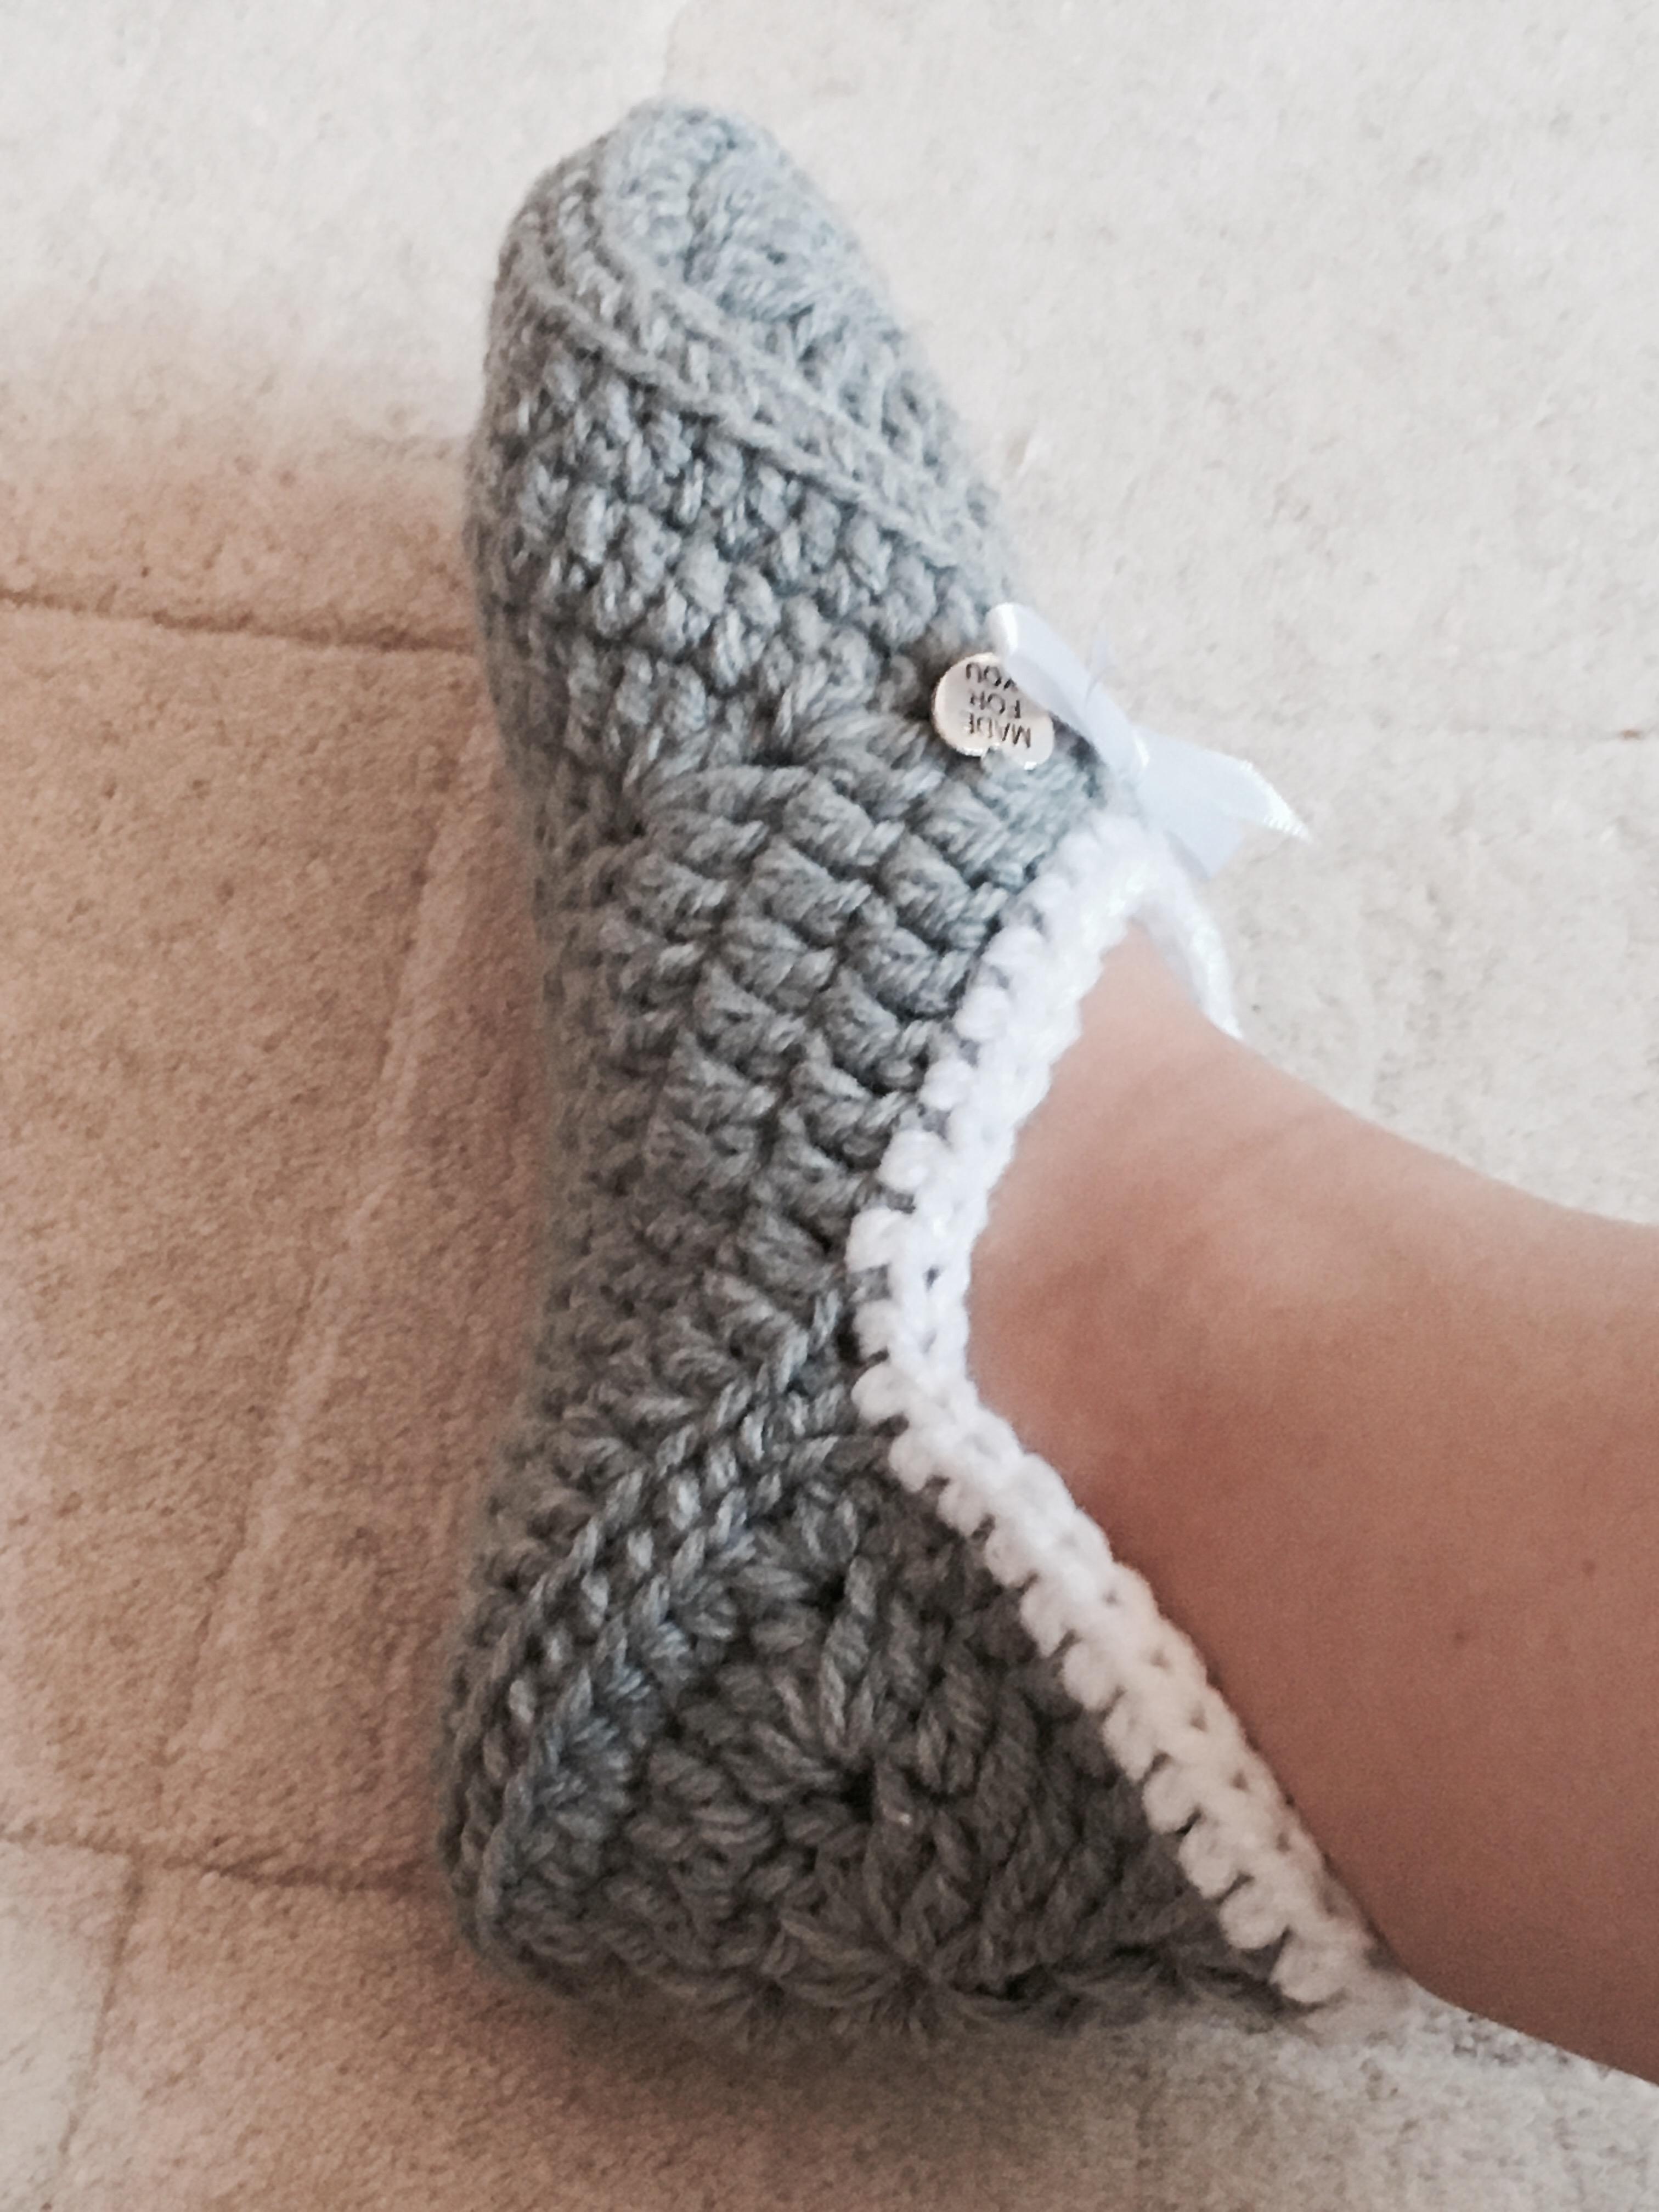 Crocheted handmade soft warm slippers, diy